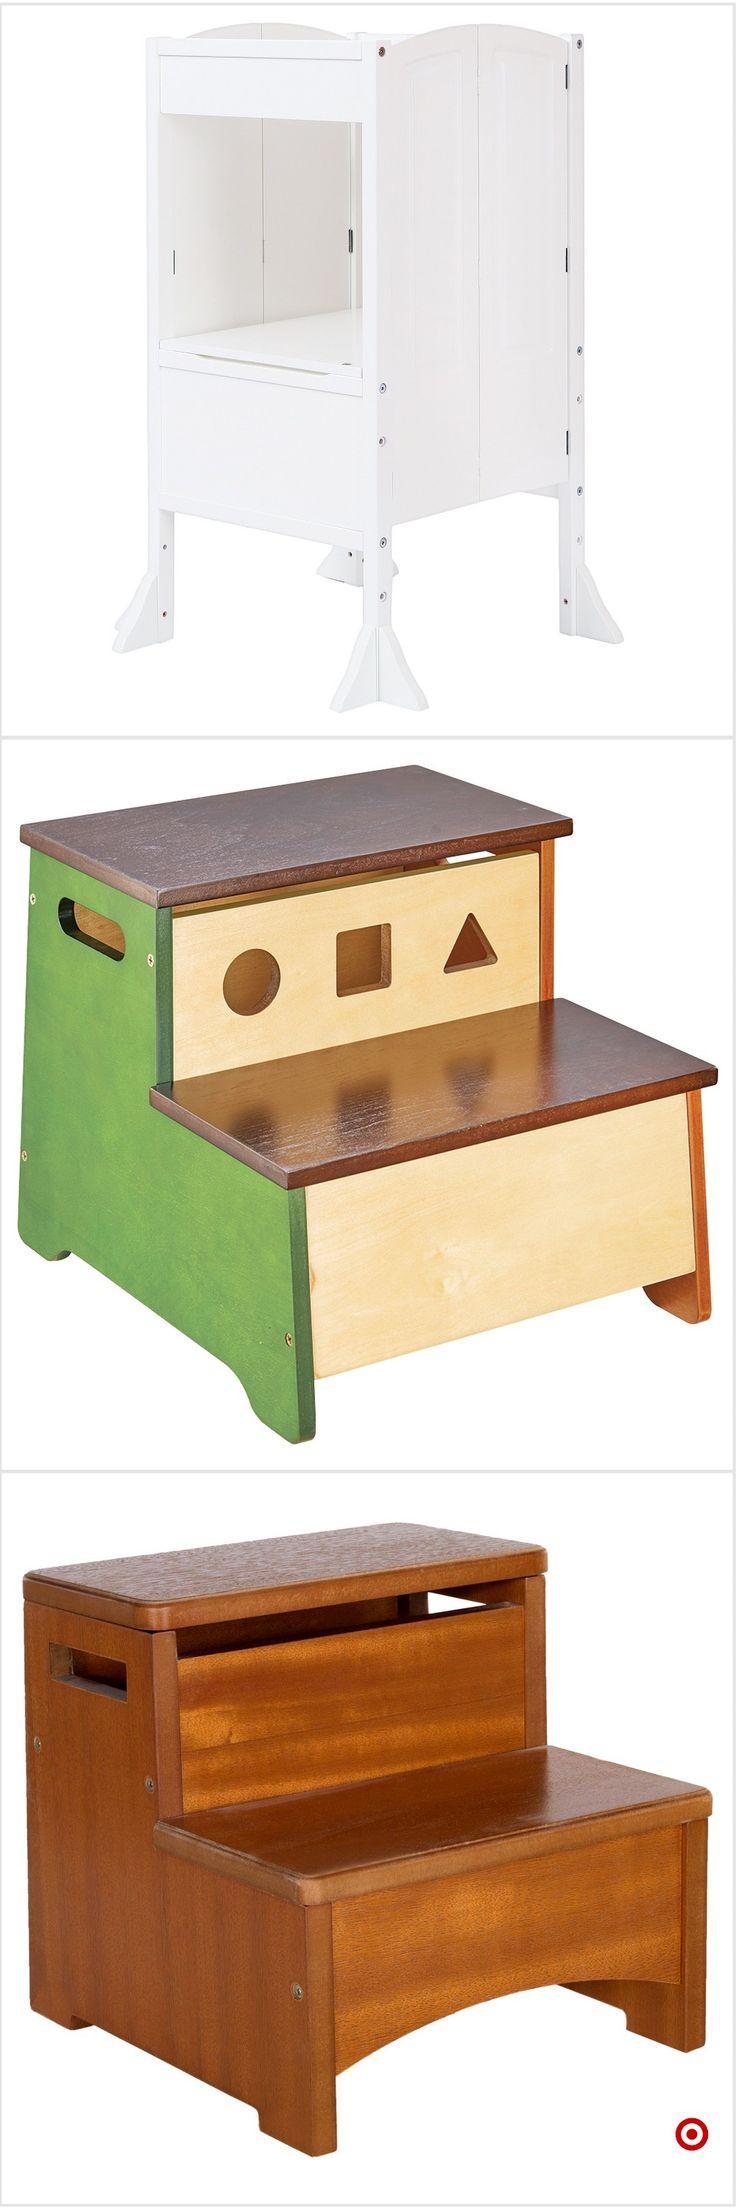 Wooden dollhouse step foot stool wood footstool stepstool furniture - Best 25 Step Stool For Kids Ideas On Pinterest Step Stool For Bed Kids Stool And 3 Step Stool